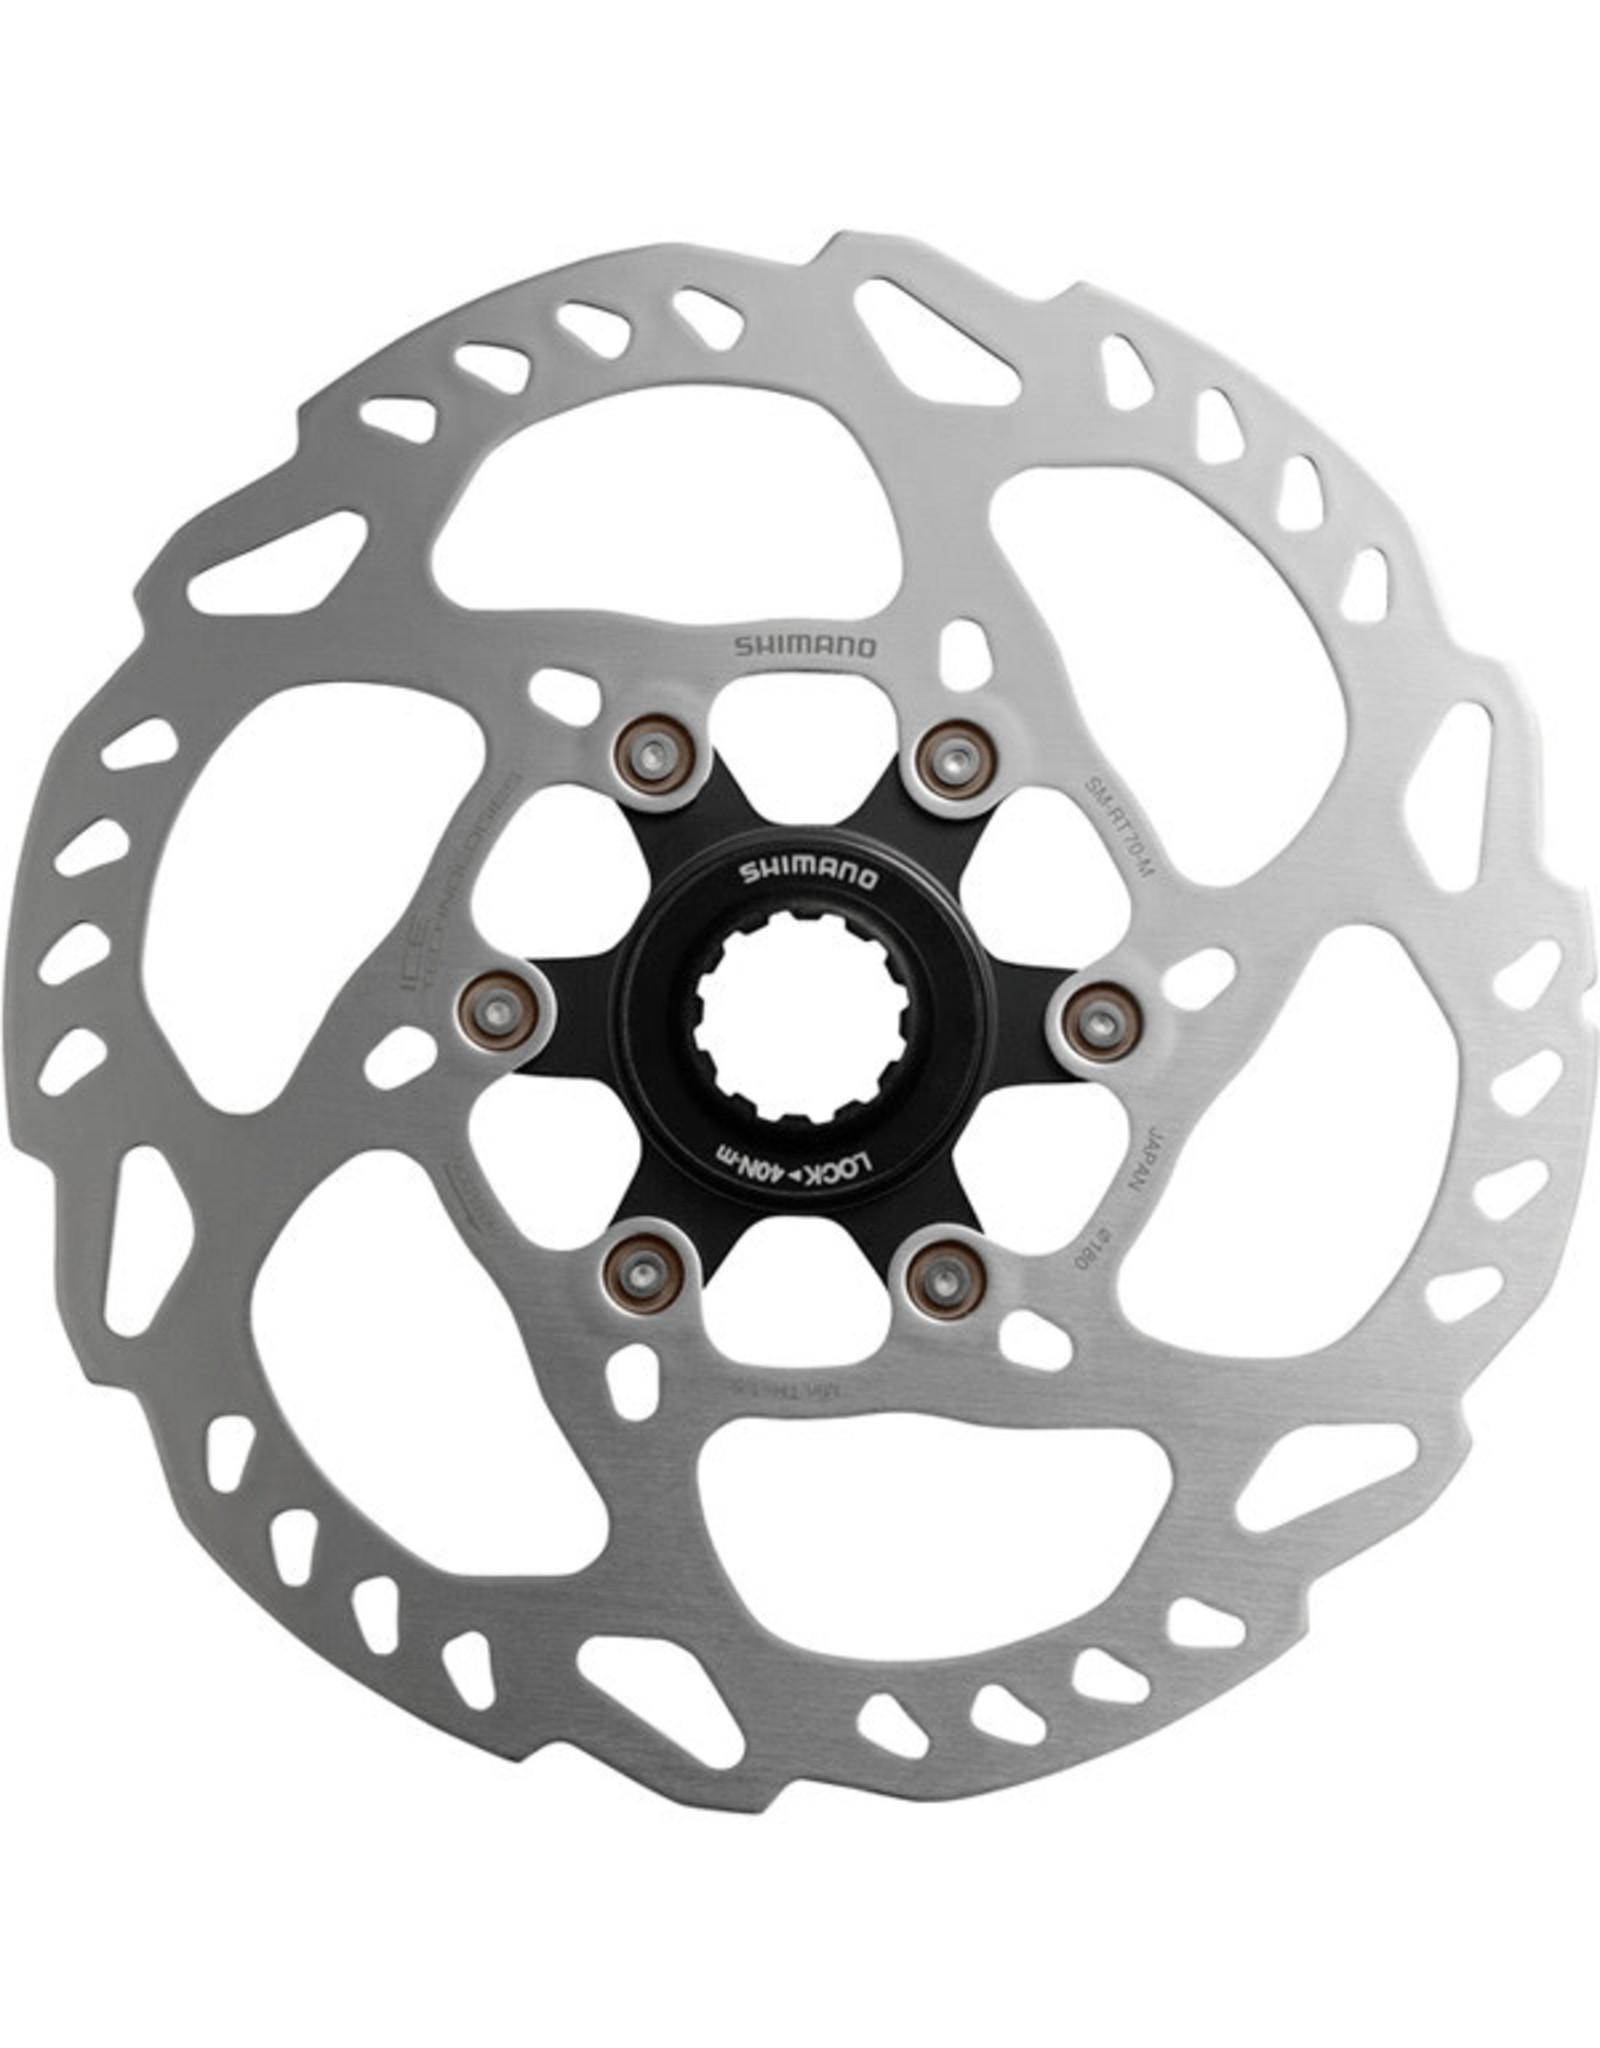 Shimano Disc Rotor SMRT70 Center-Lock